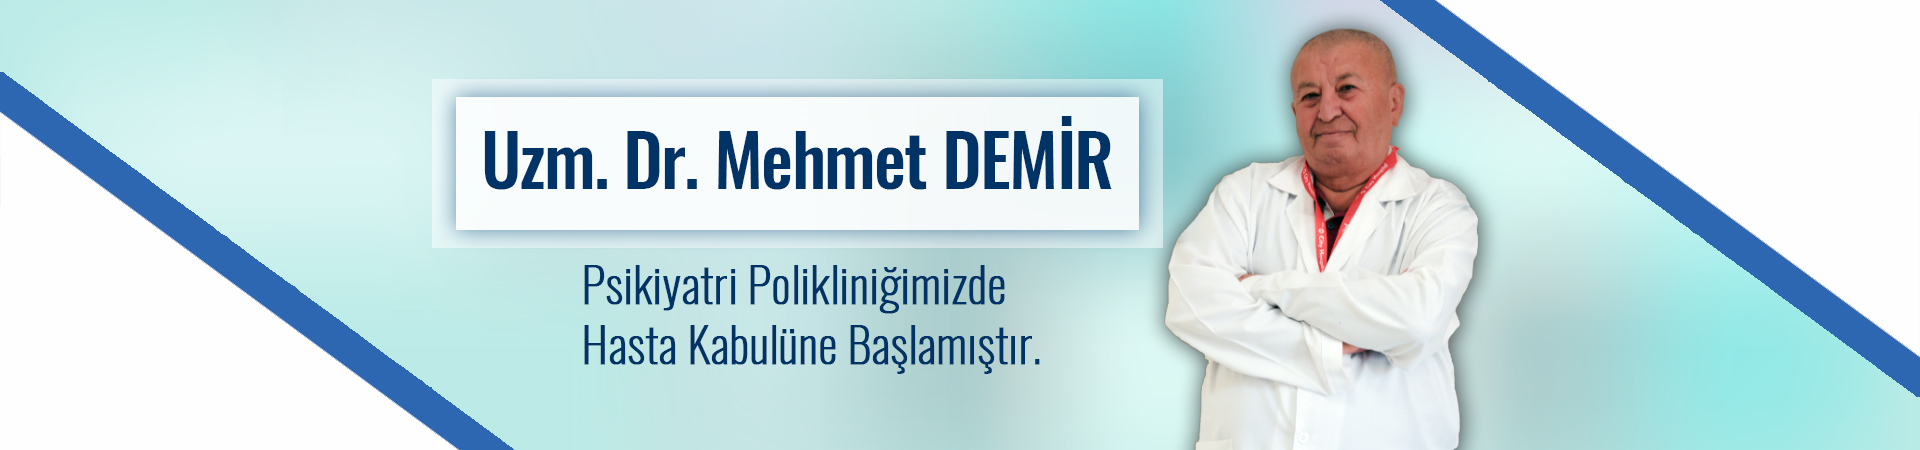 uzm-dr-mehmet-demir-city-slider